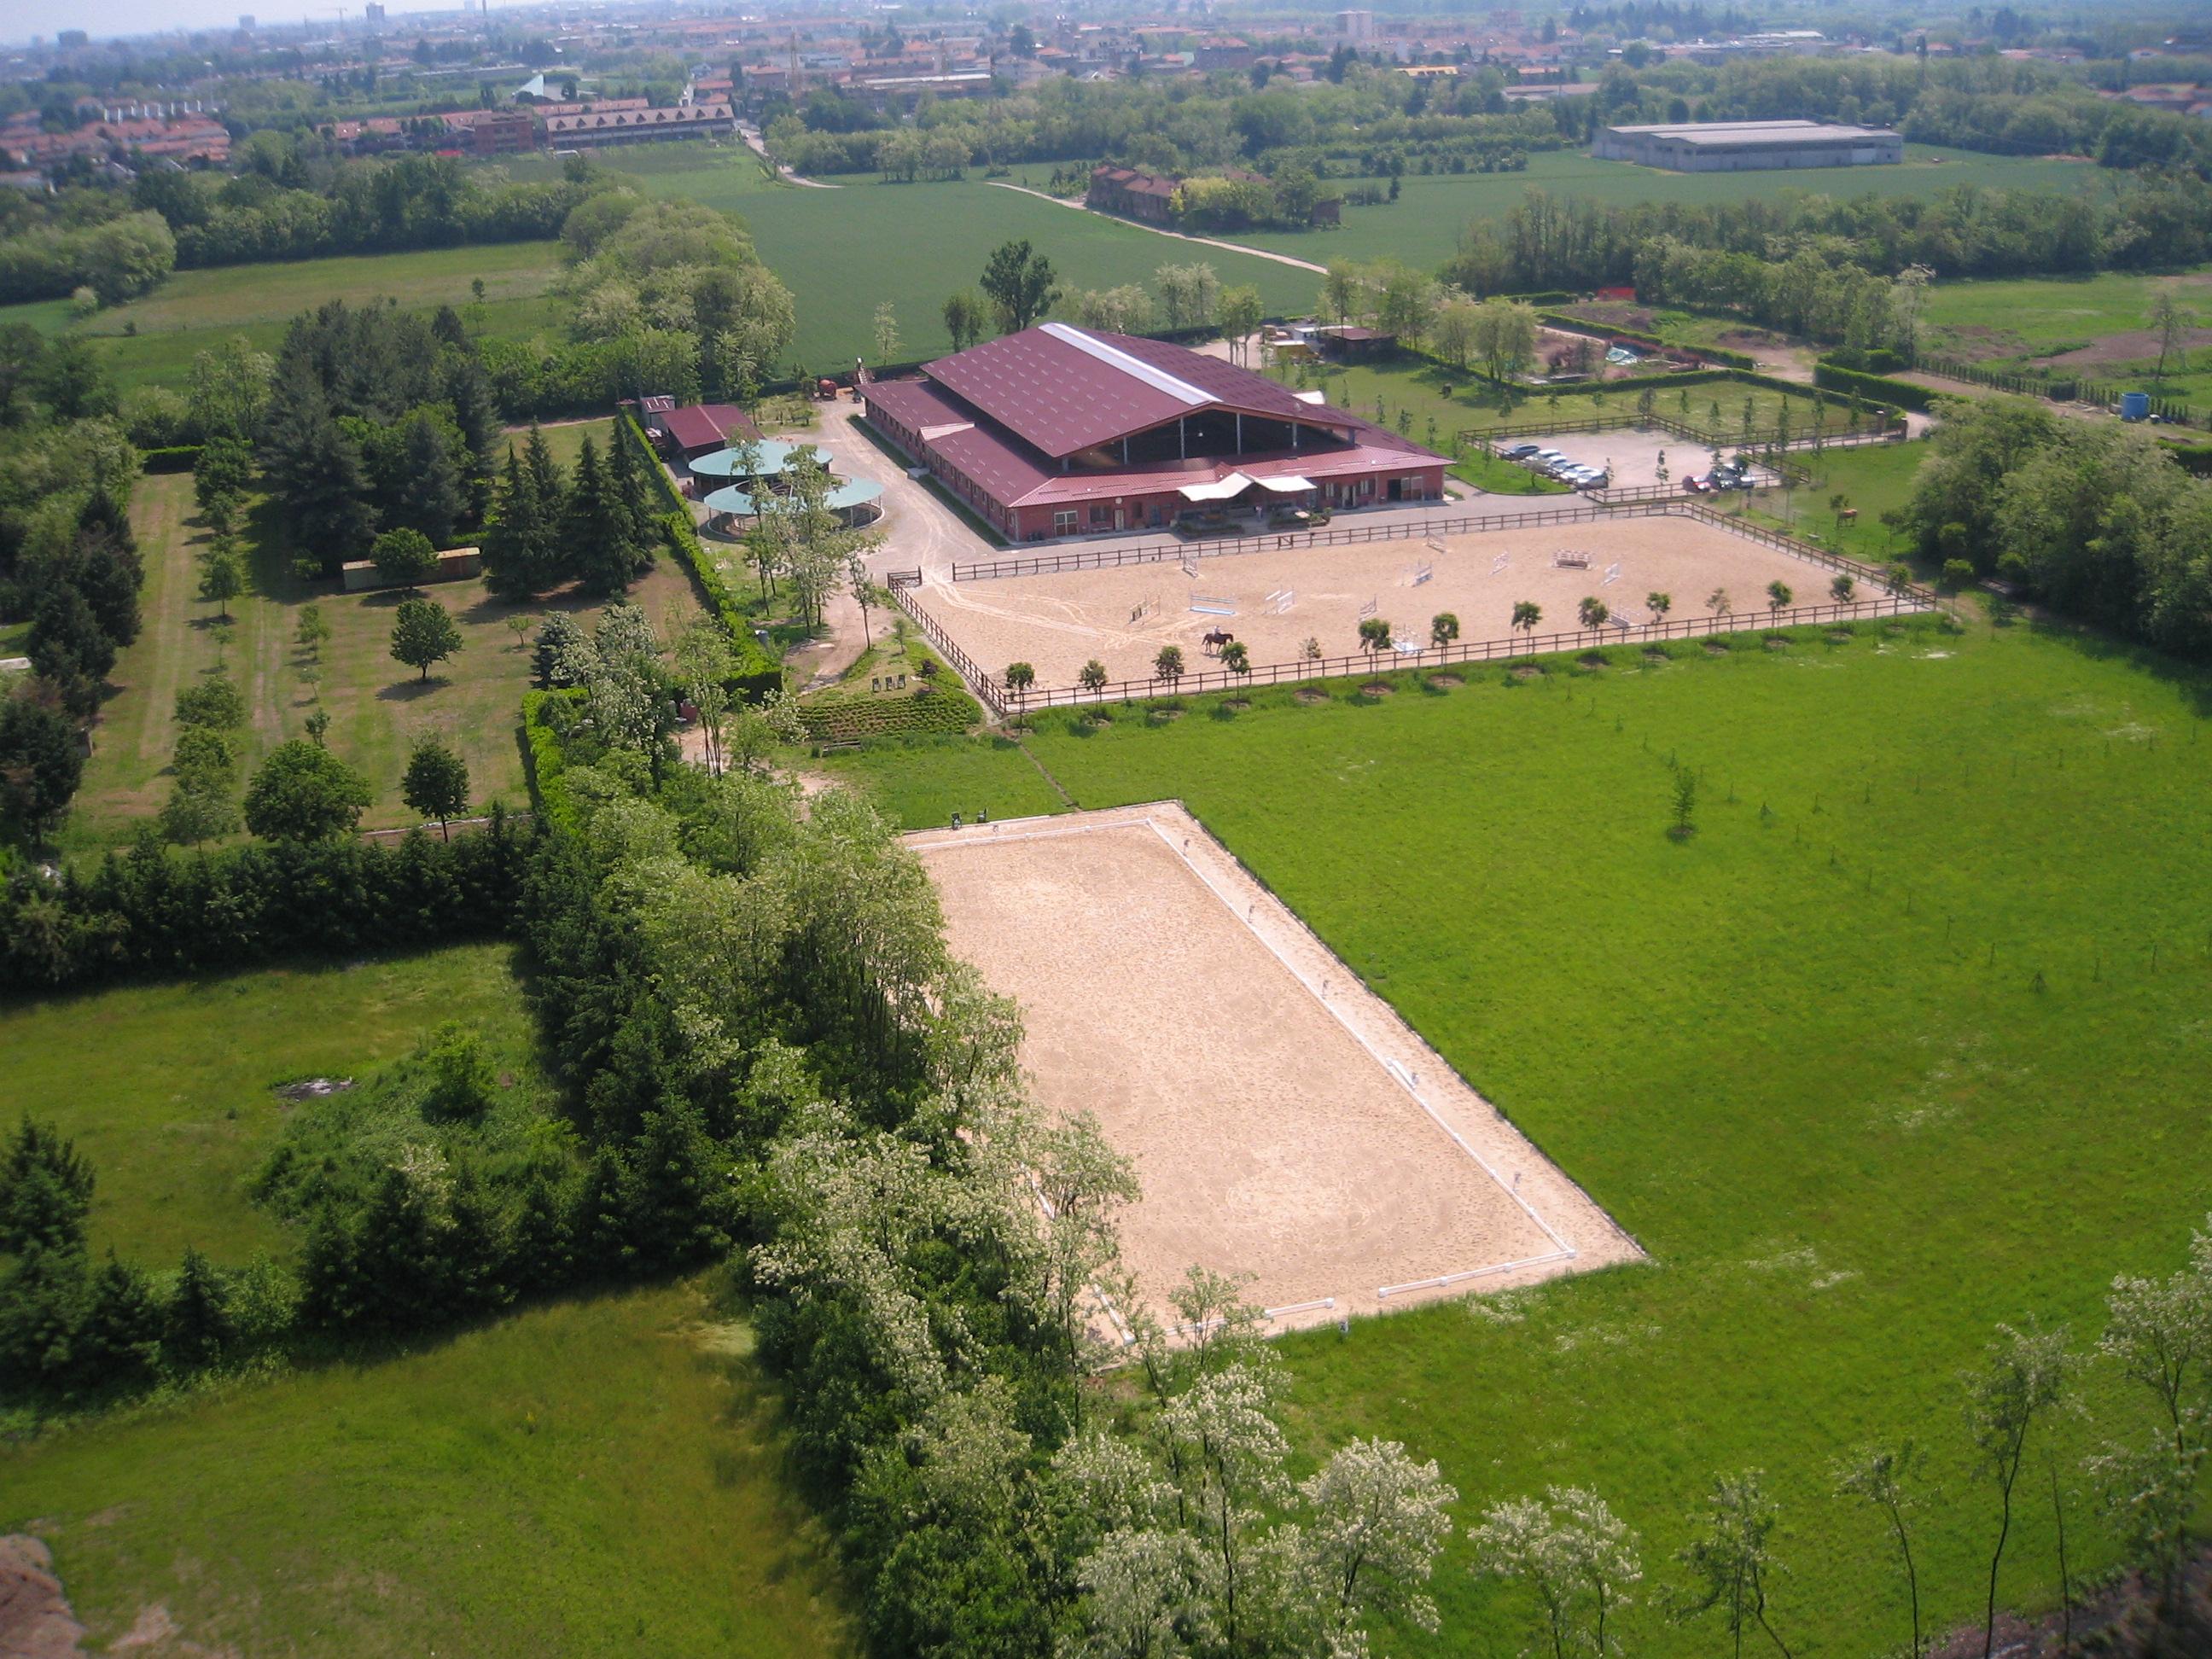 Centro Ippico